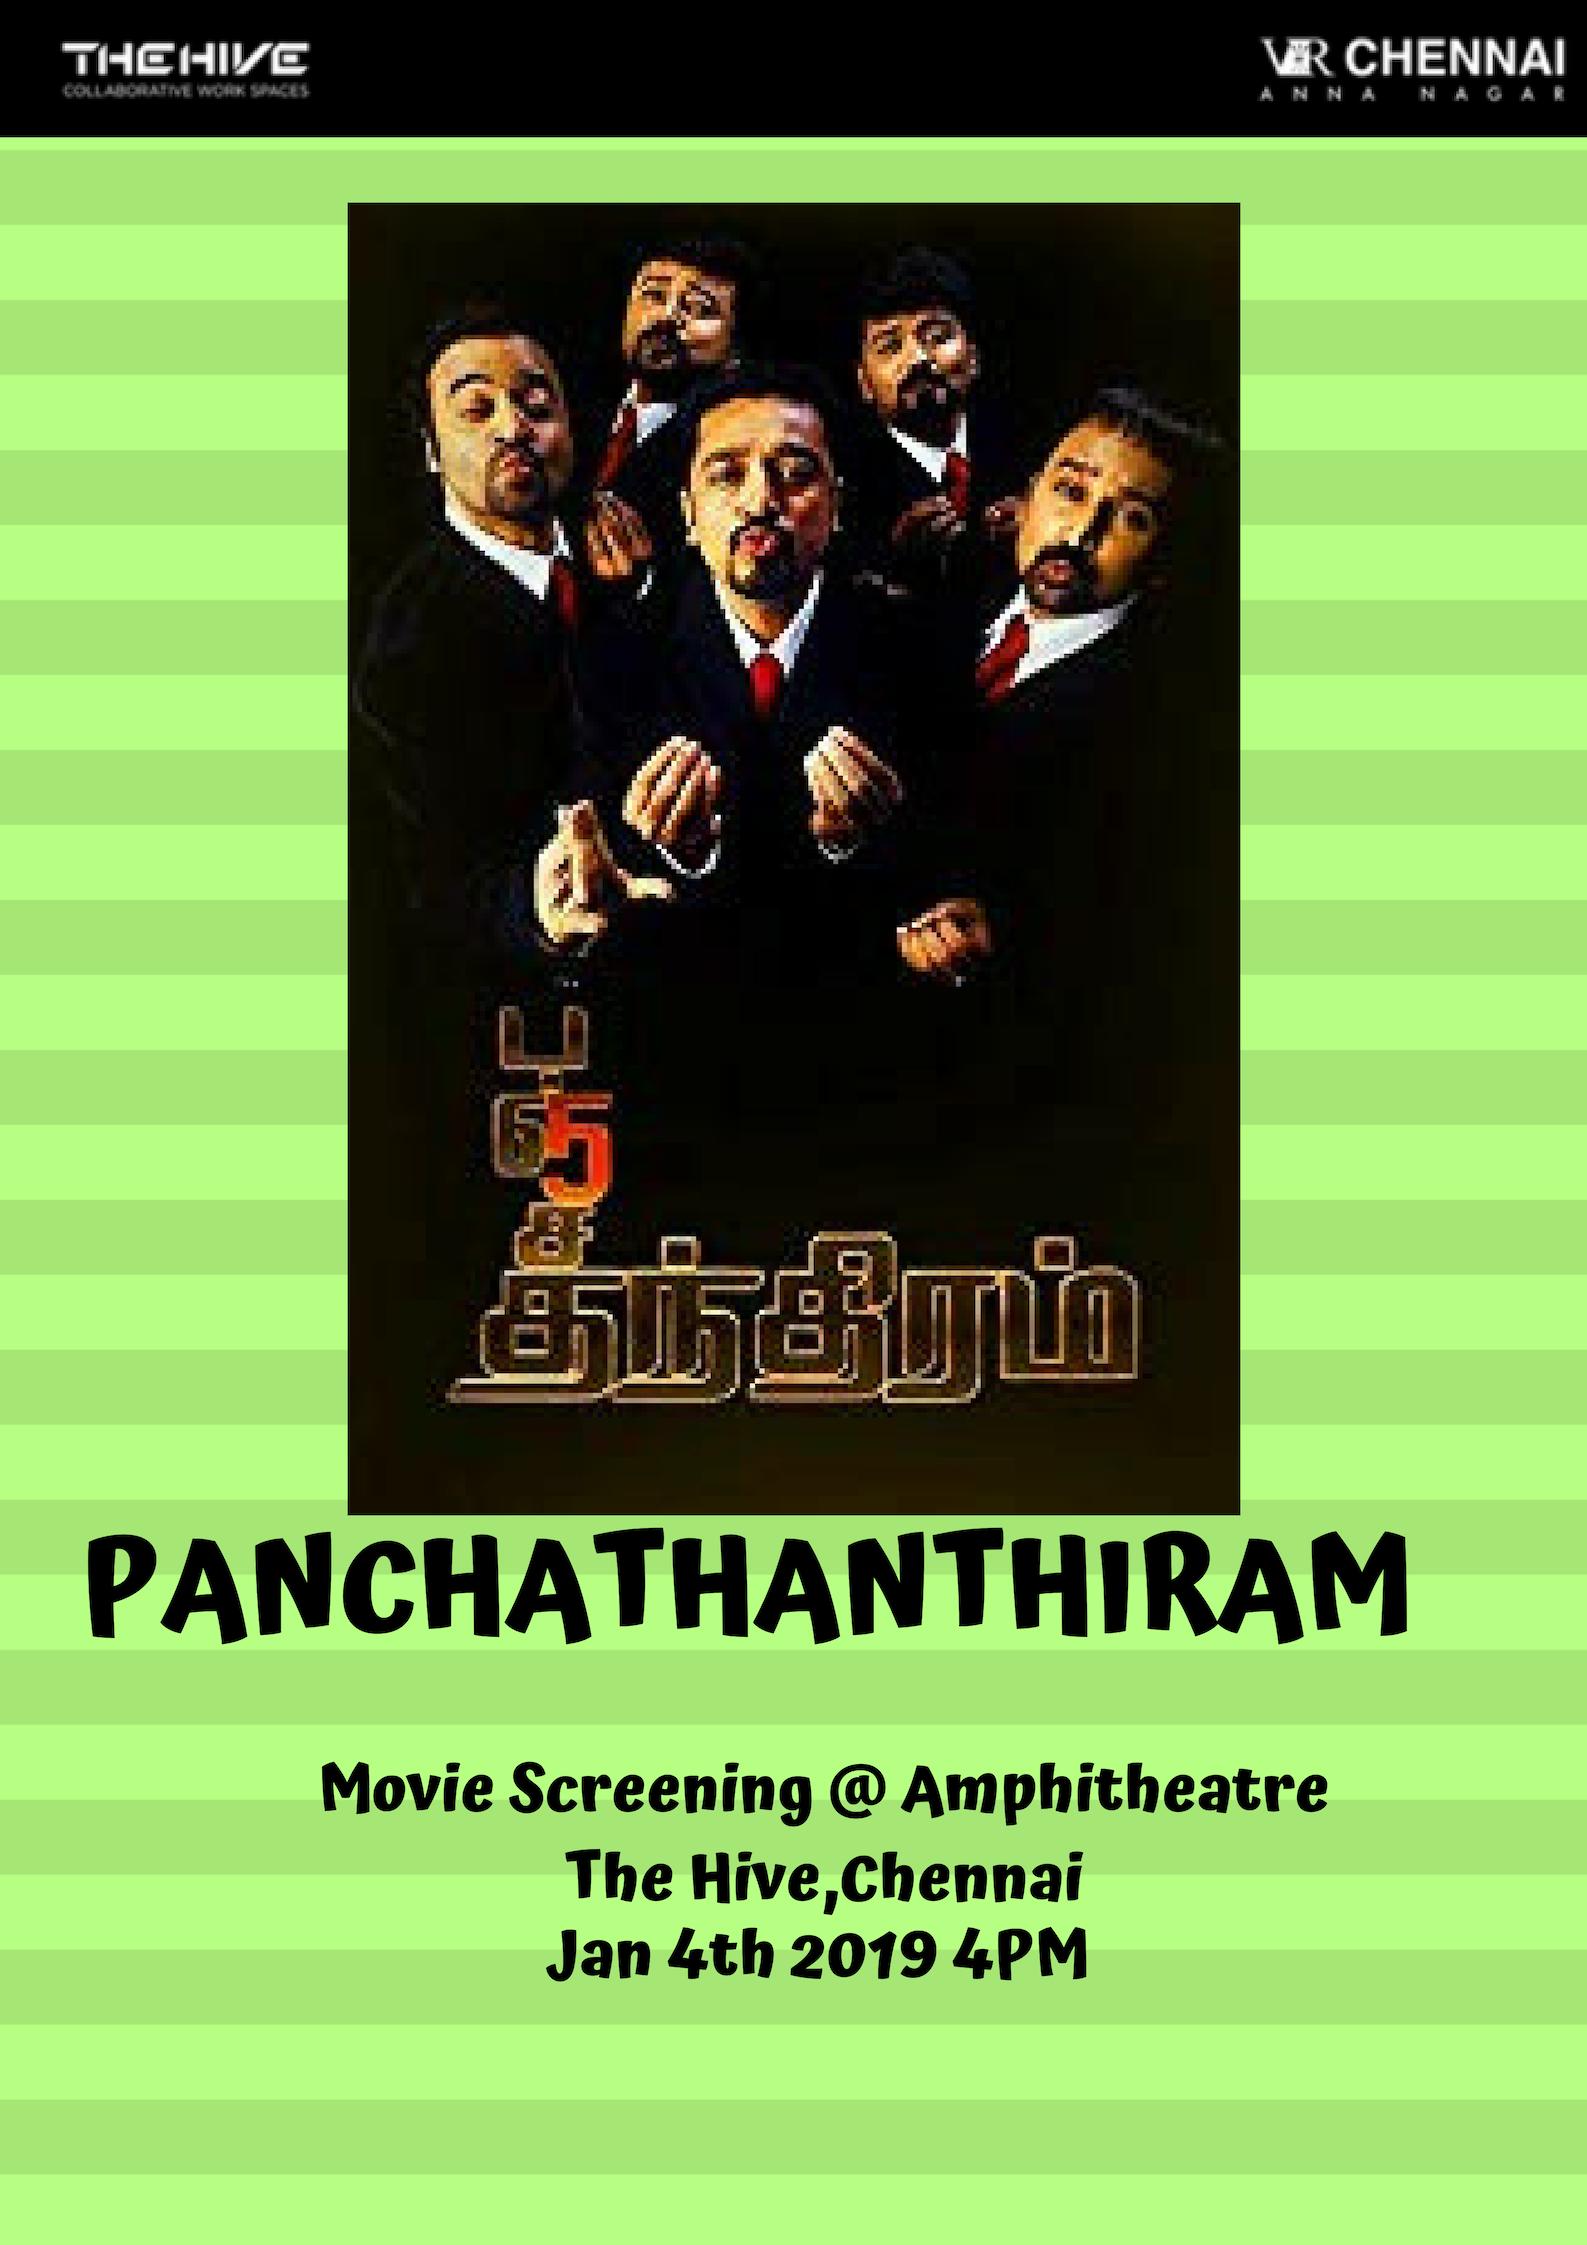 Panchathanthiram poster canva.png